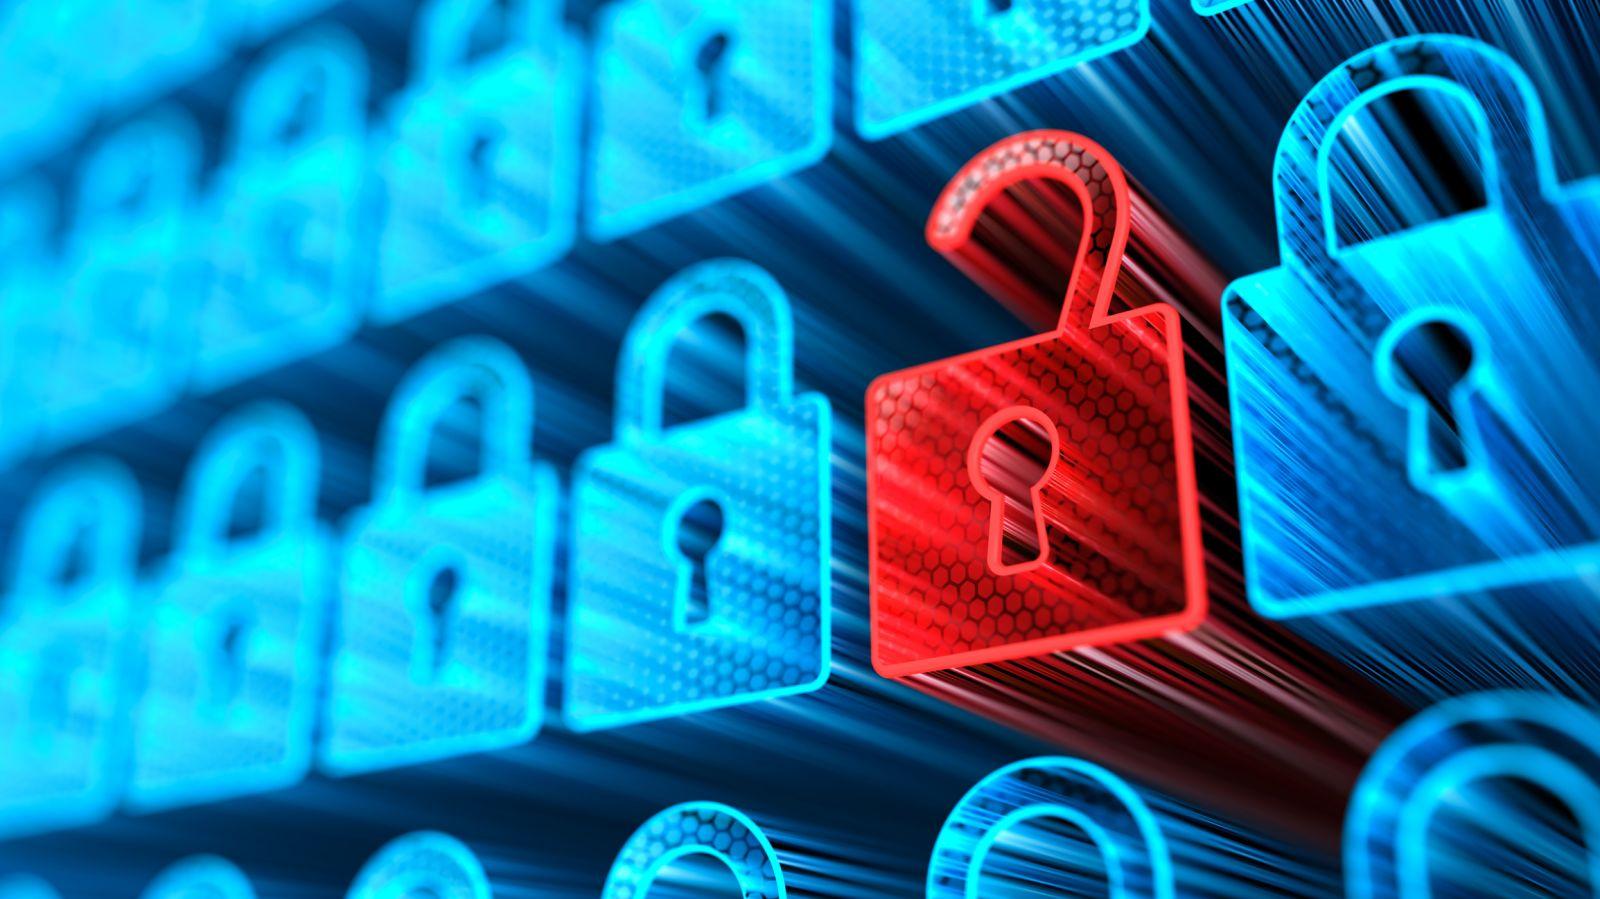 """Дія"" діє. Как защититься от утечек персональных данных"